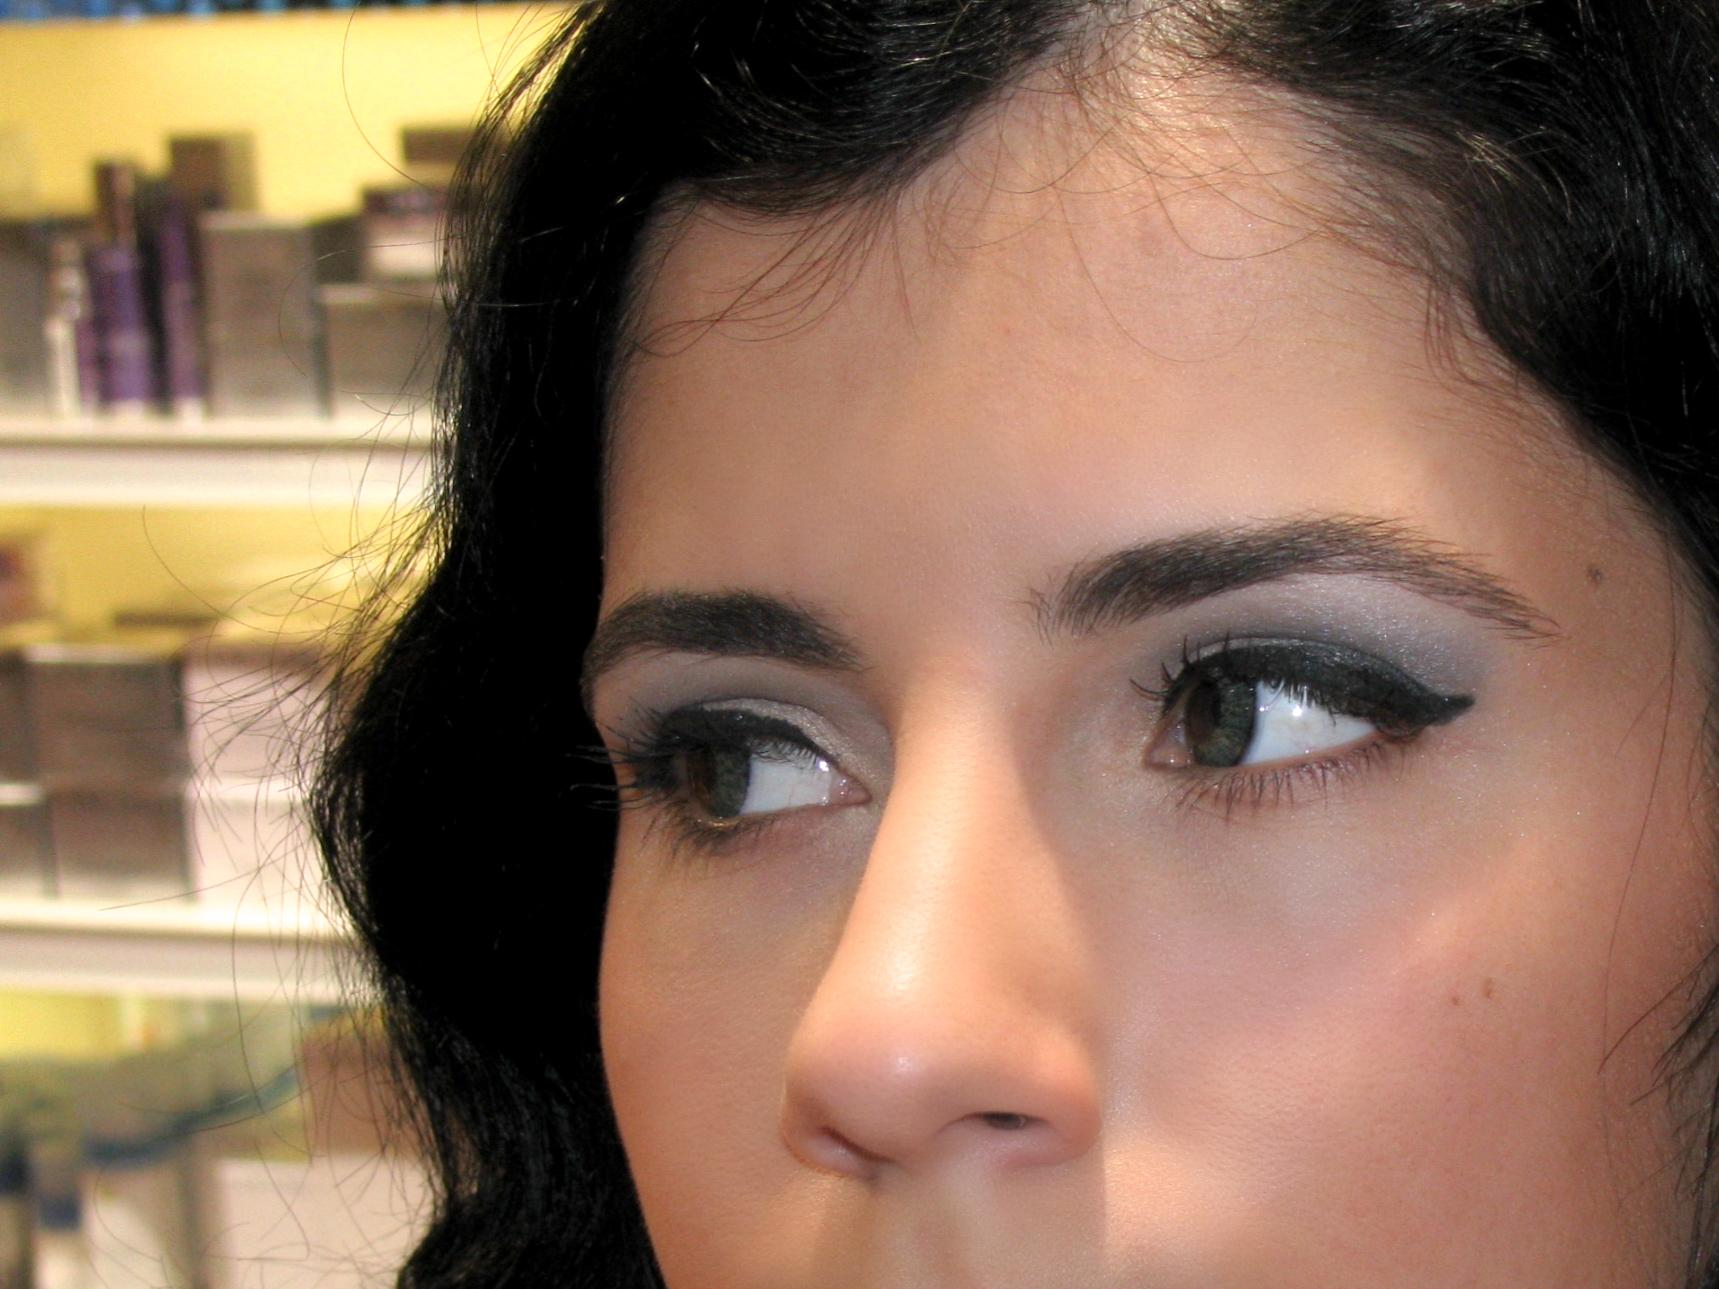 como fazer eyeliner fácil cateye